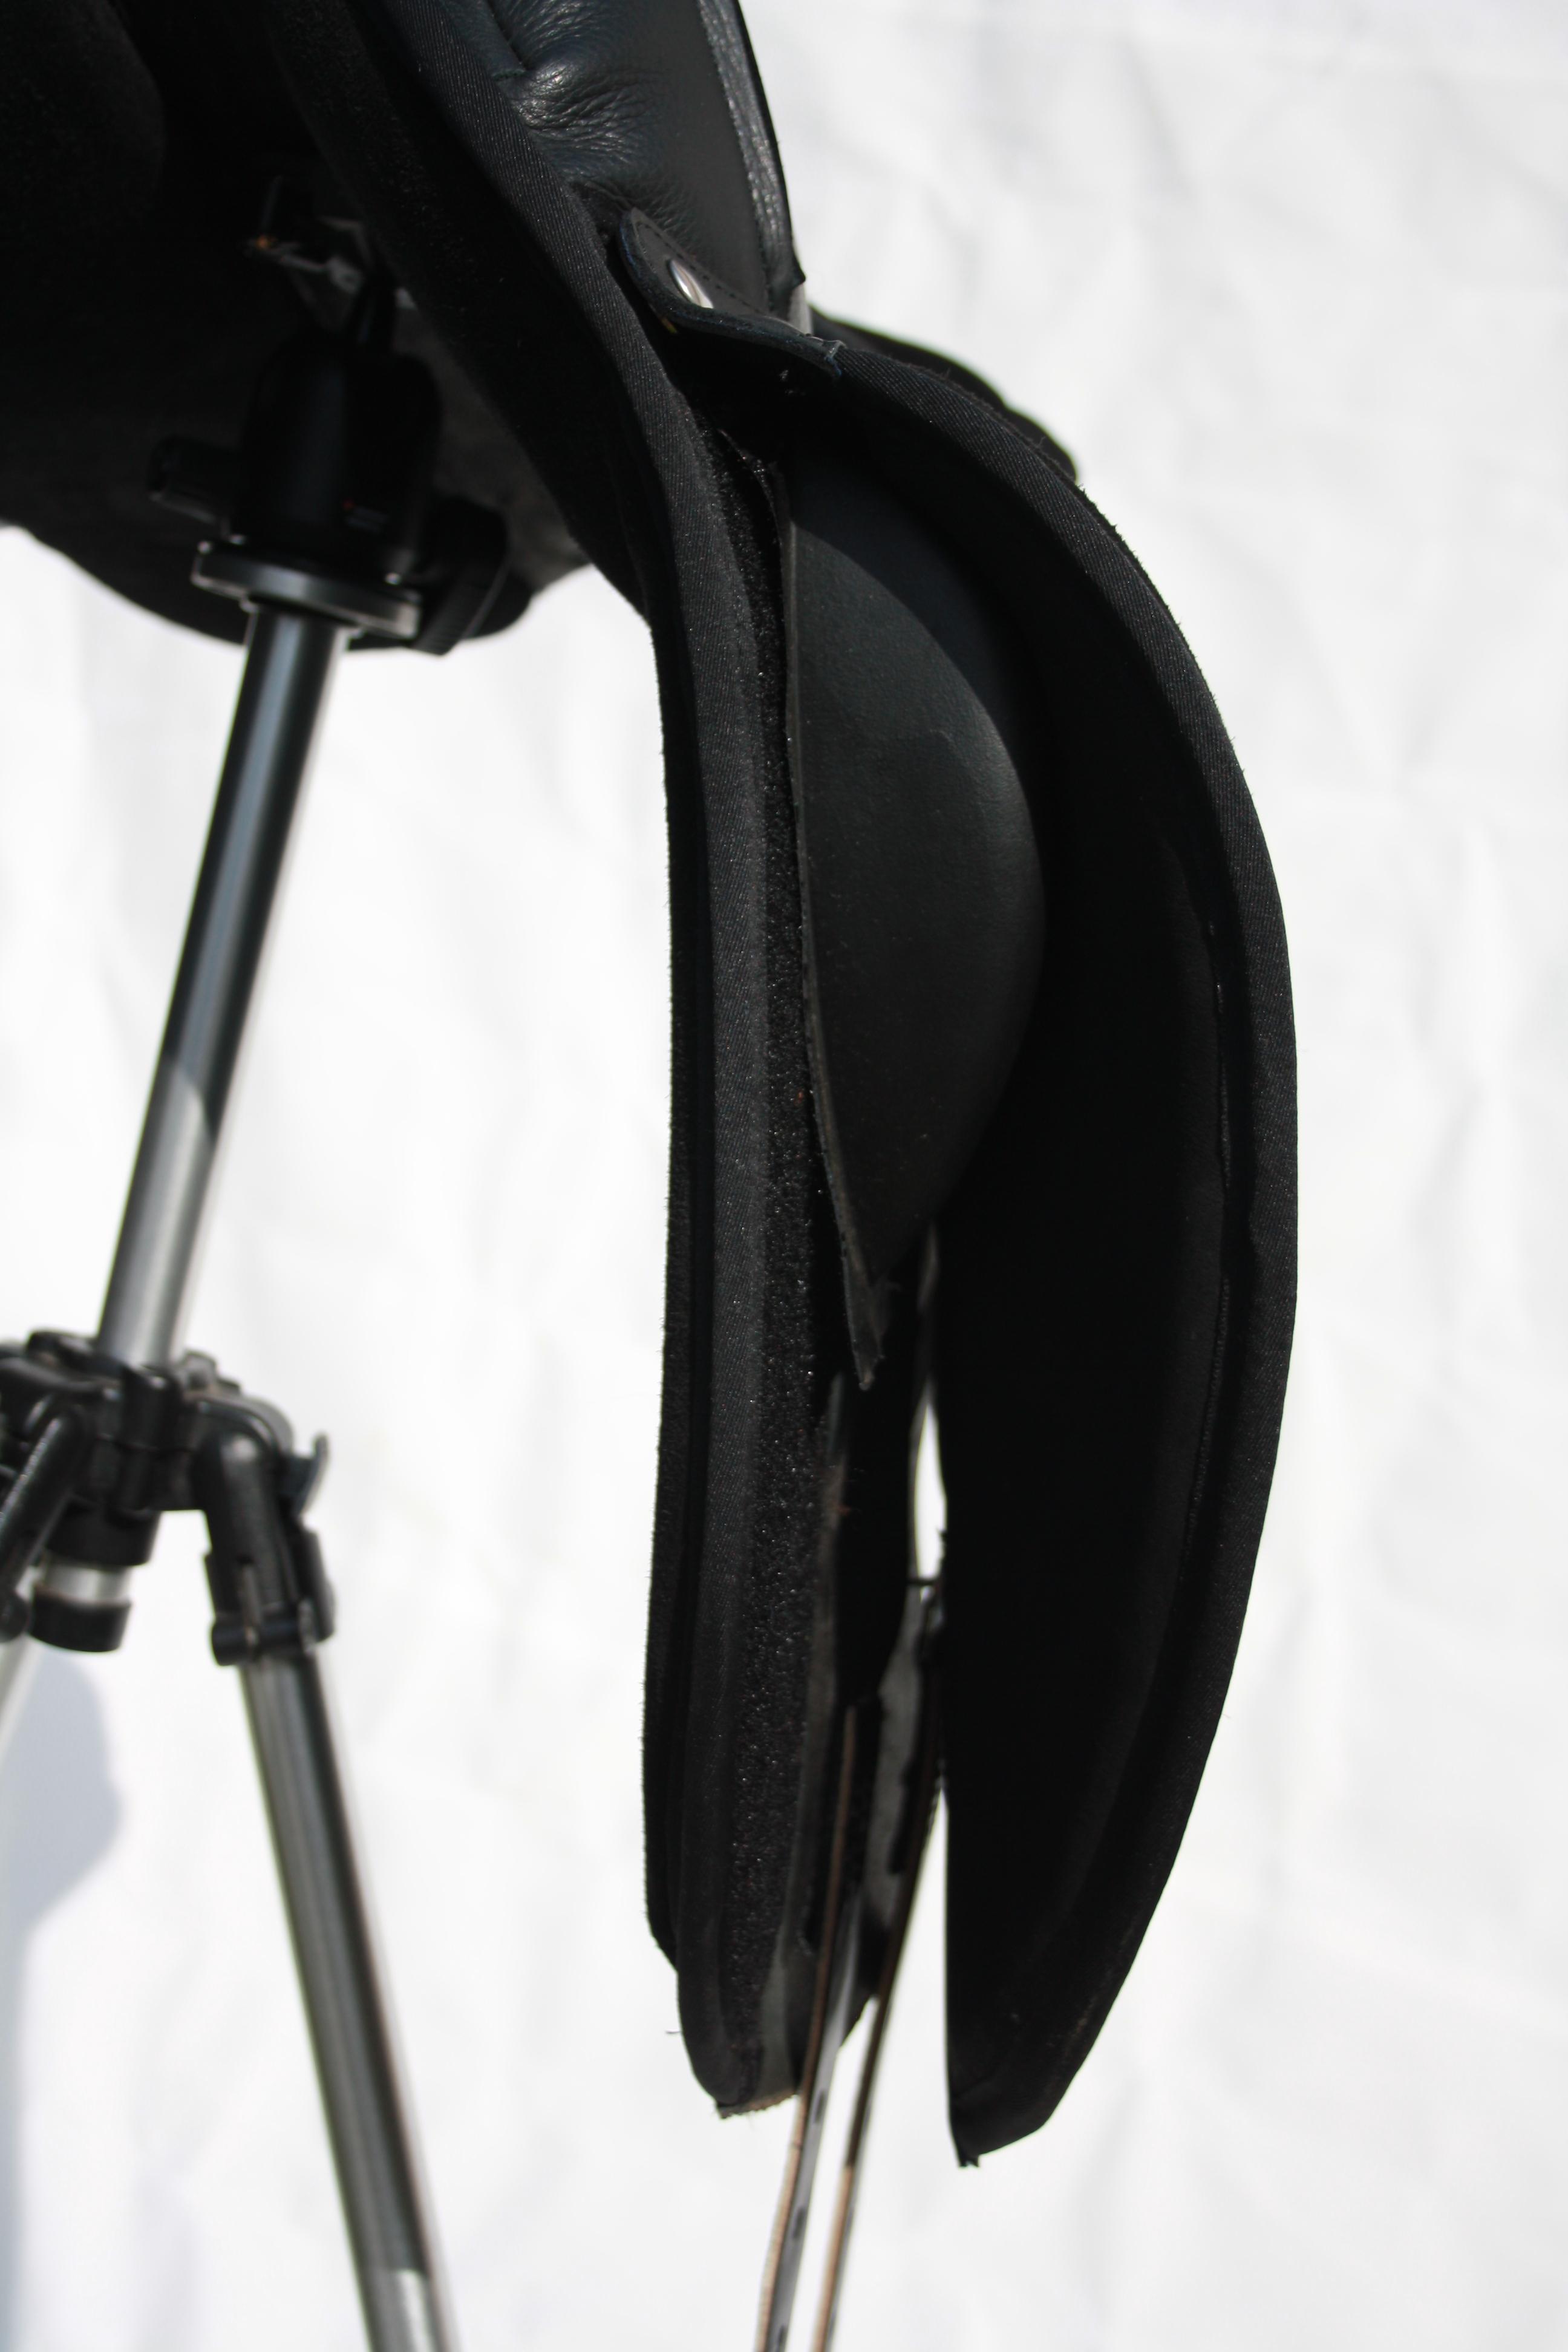 Velcro set on knee role